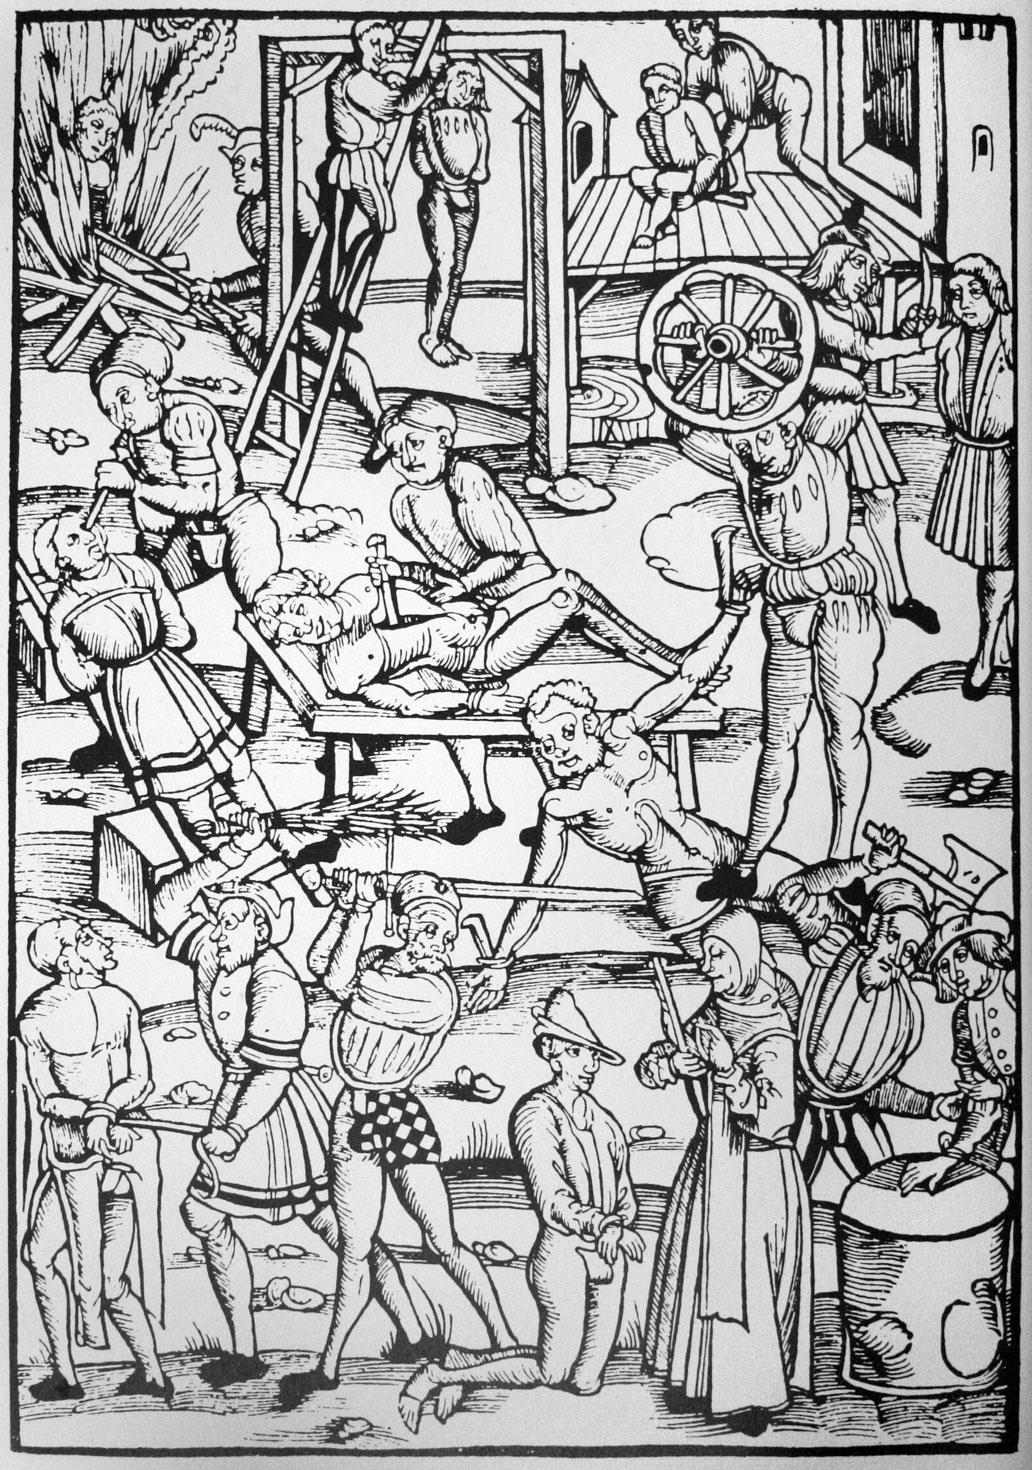 LA HISTORIA HUMANA JAMAS CONTADA Y QUE JAMAS LES CONTARAN...  CAPITULO  IV Punishing-witches-Laienspiegel